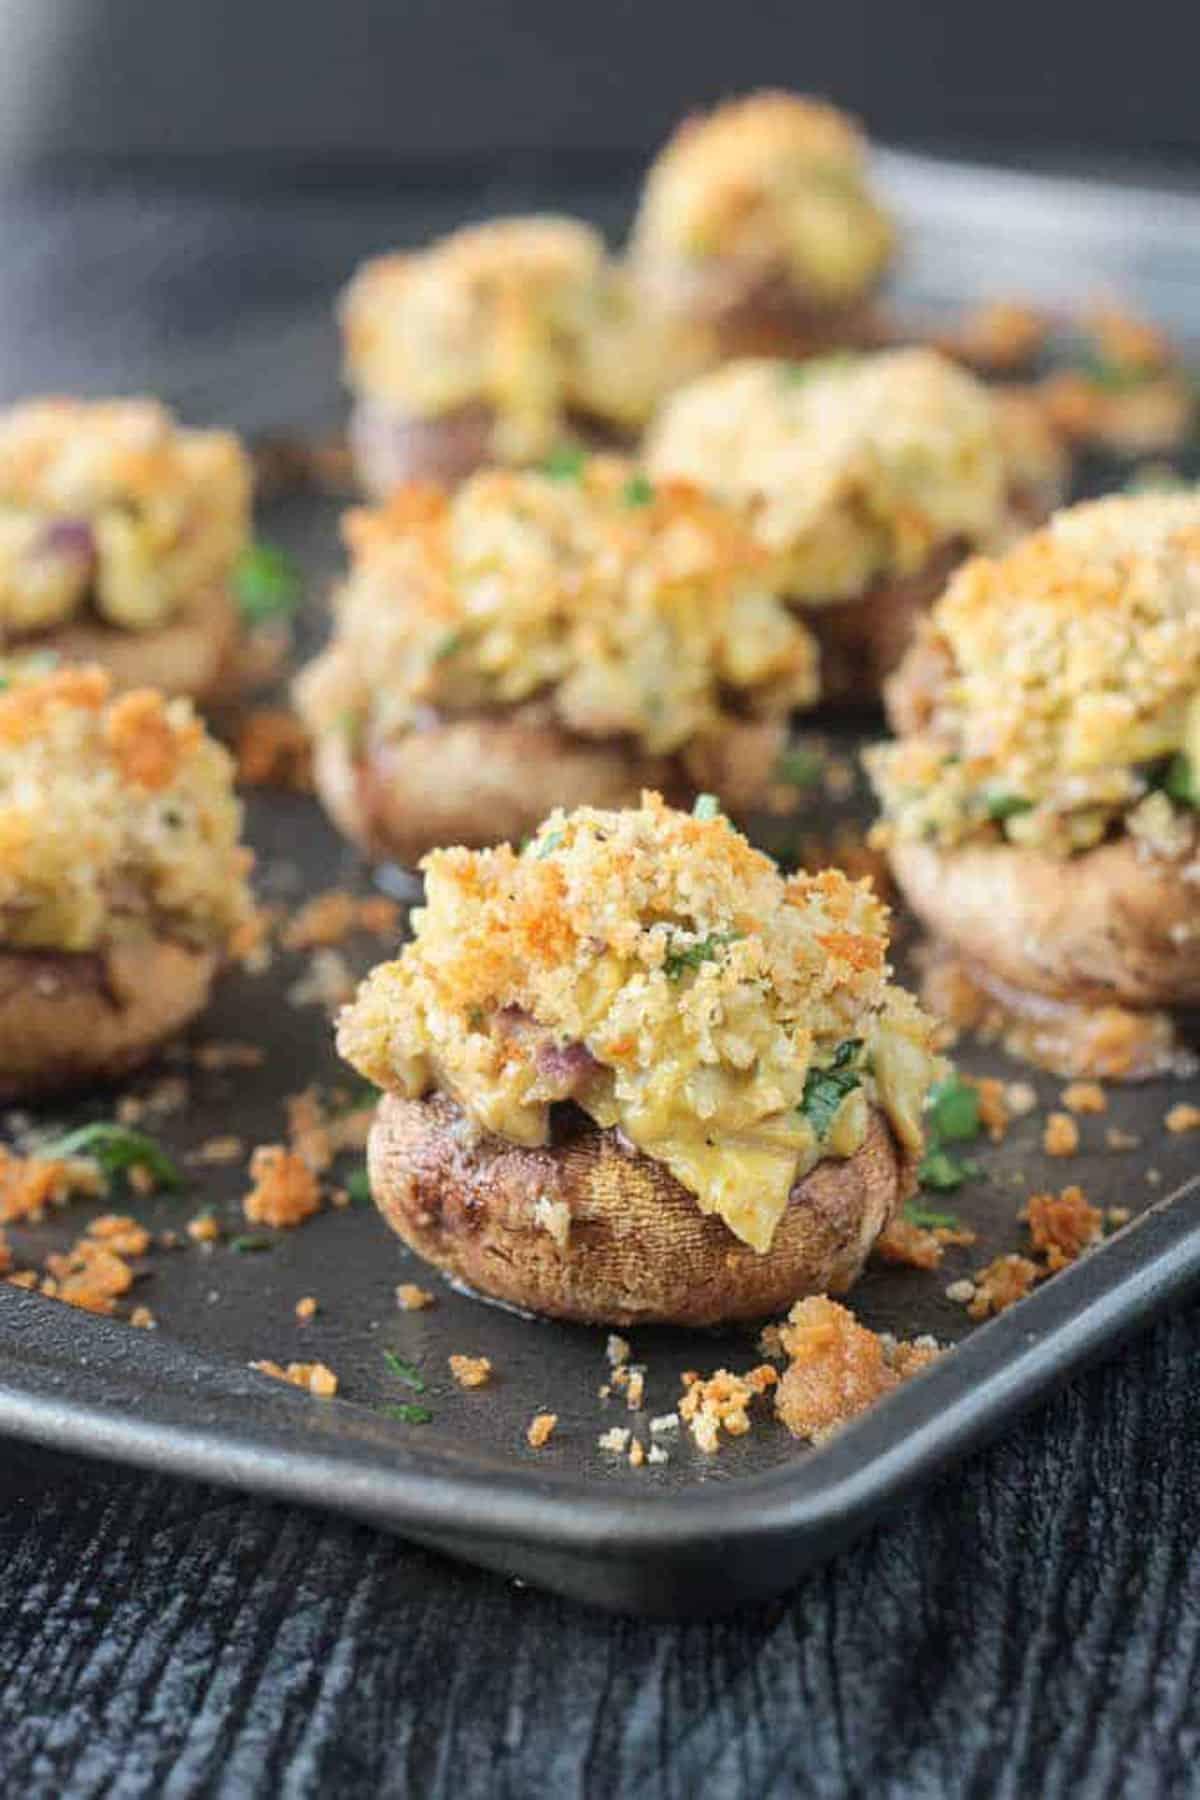 Close up of the artichoke filling in stuffed mushrooms.